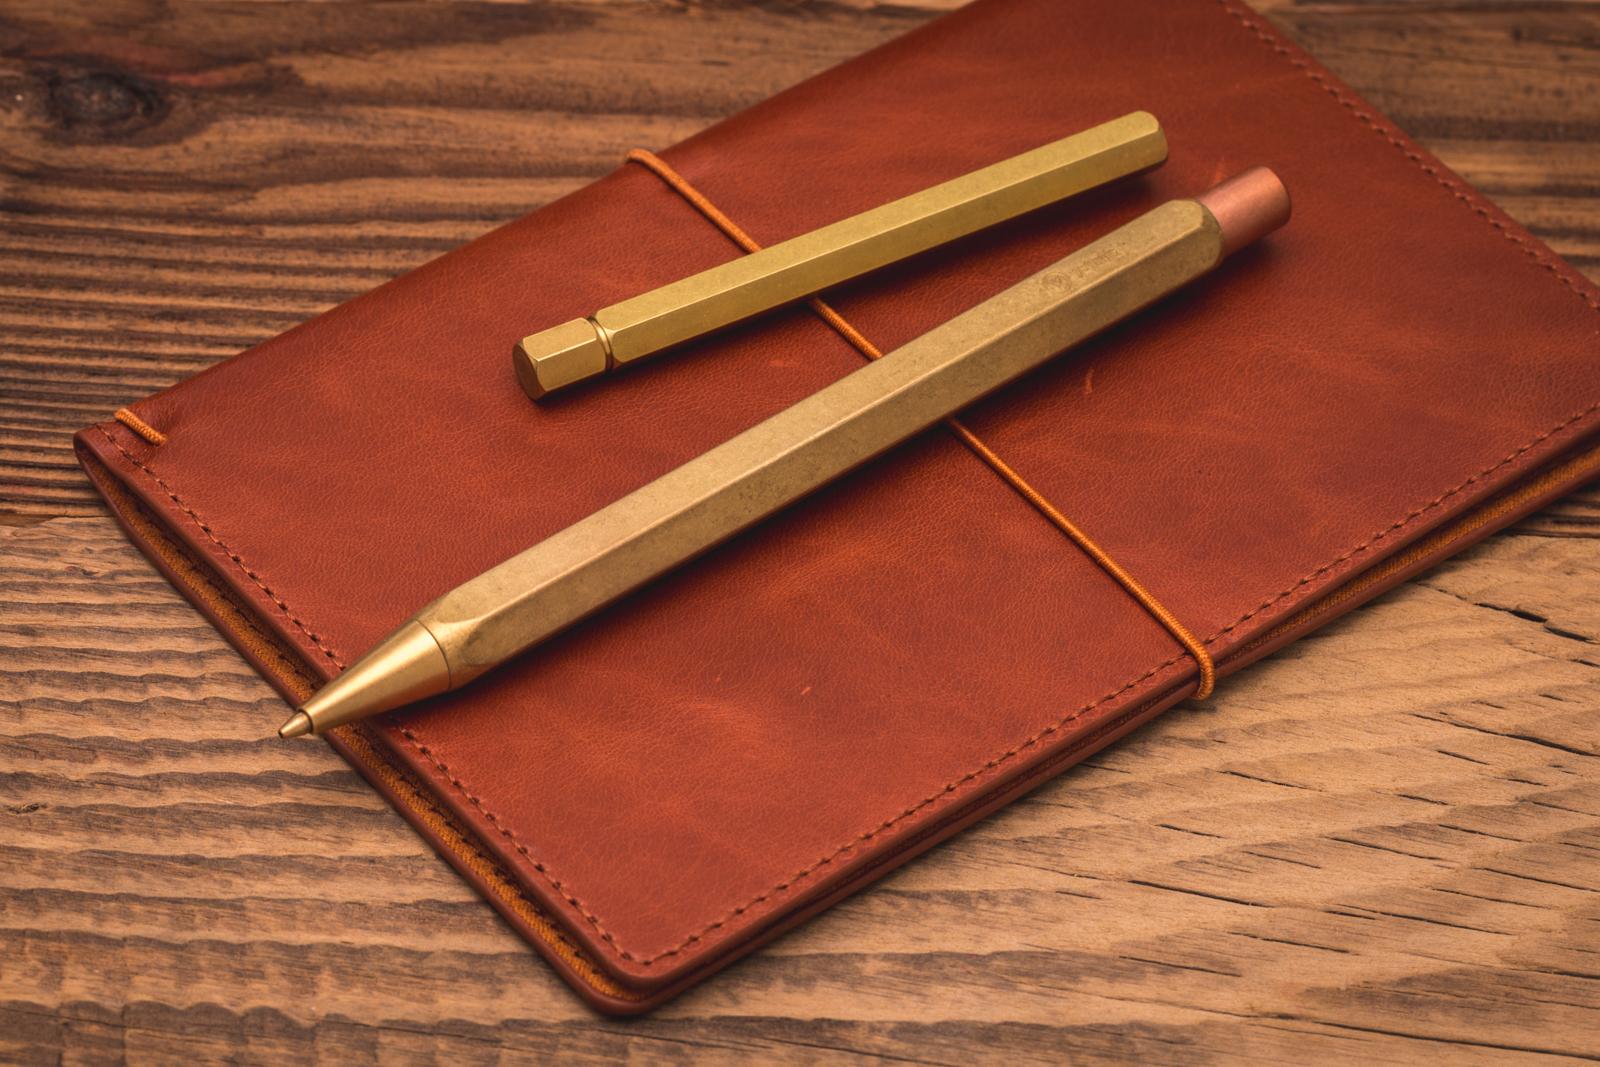 Ystudio - Mechanical Pencil